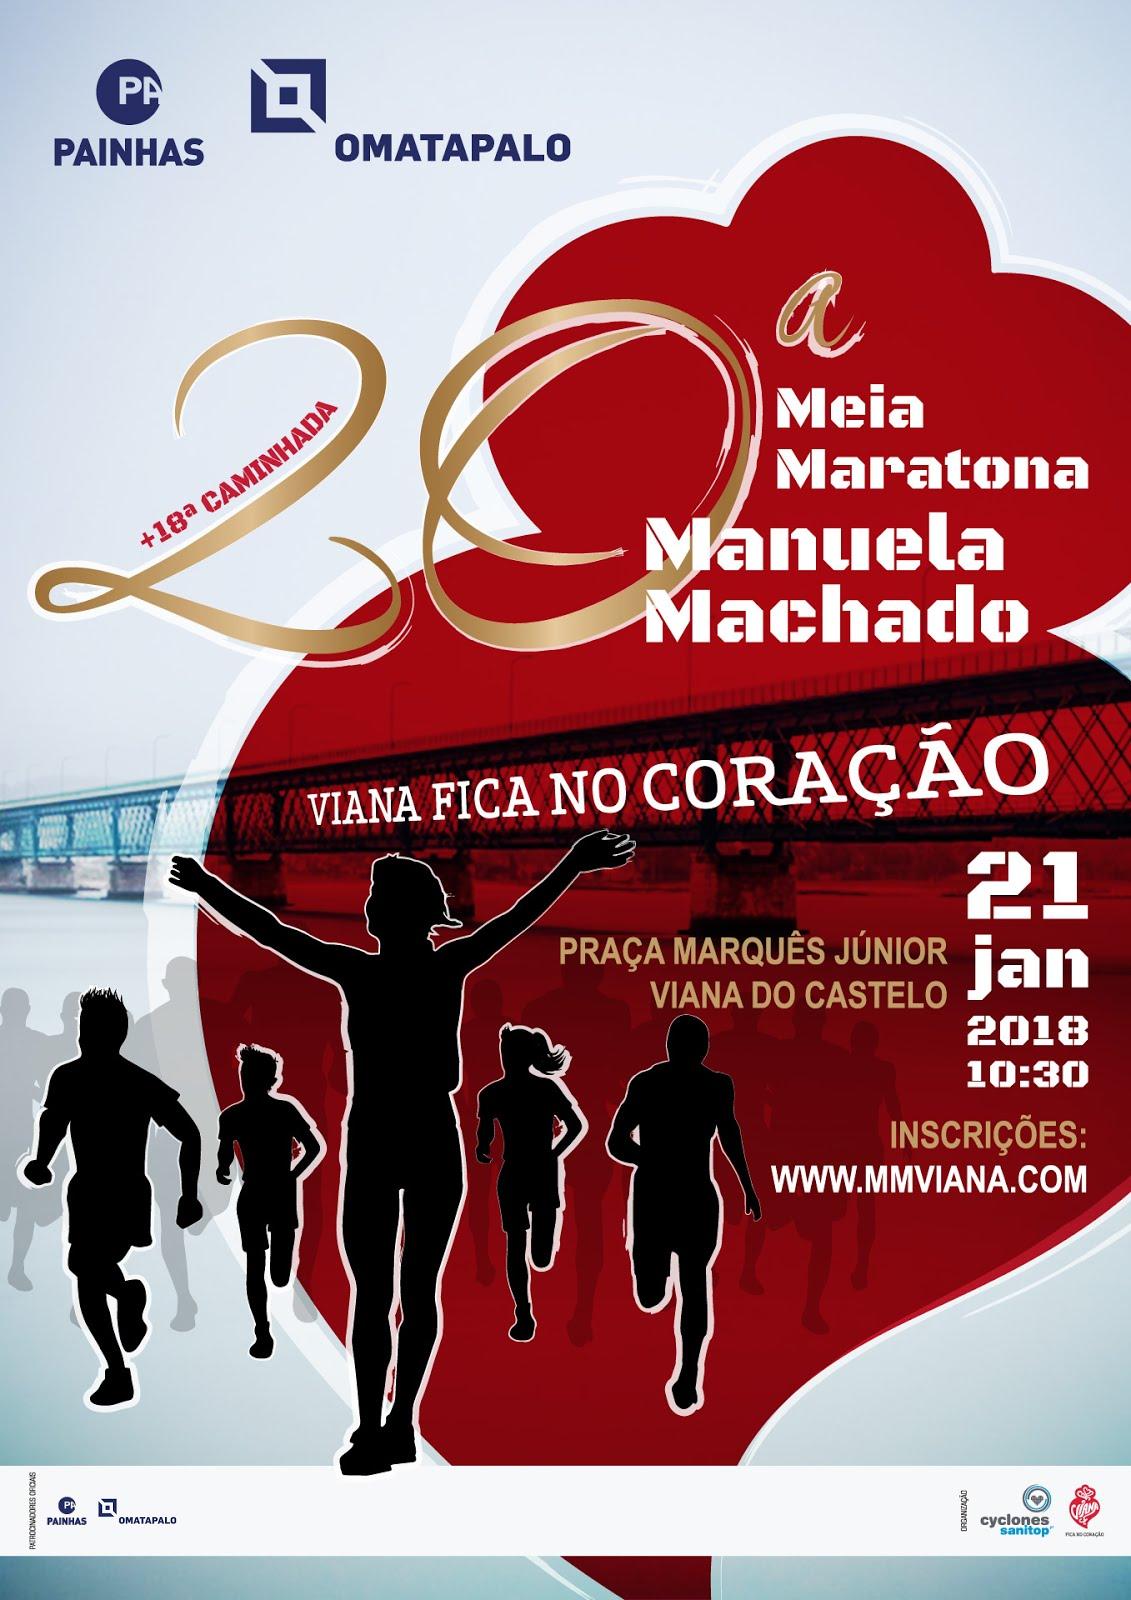 Meia Maratona Manuela Machado 2018